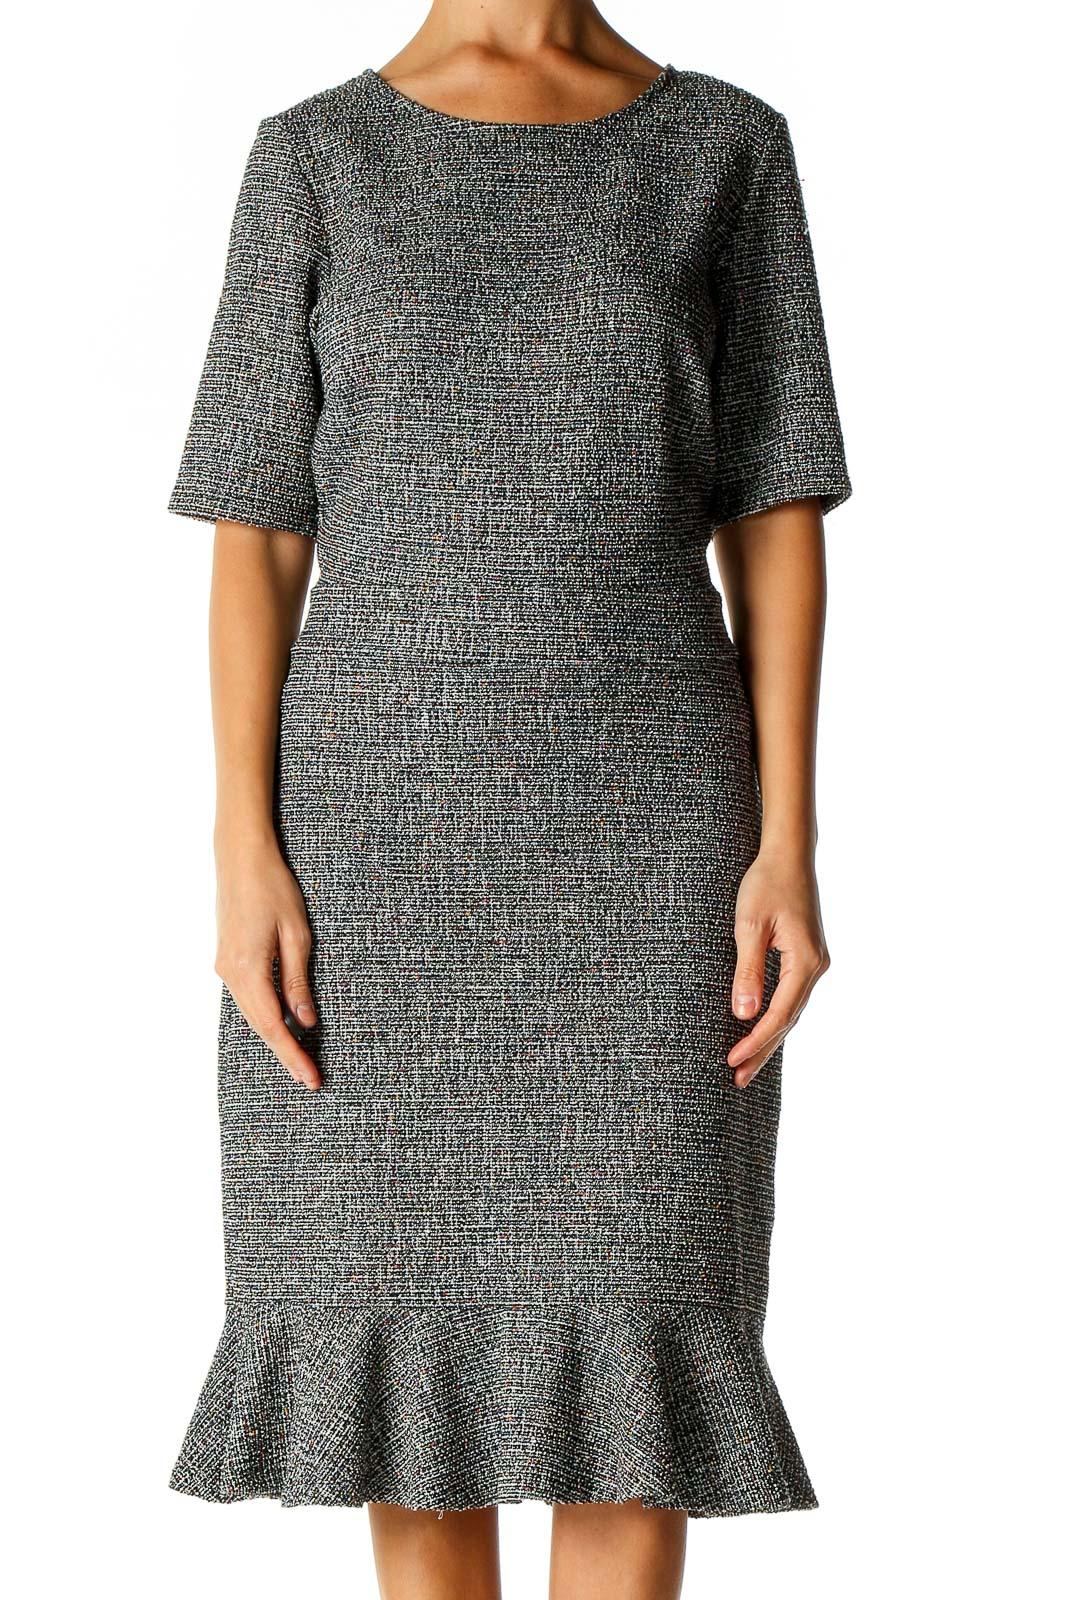 Gray Textured Work Sheath Dress Front